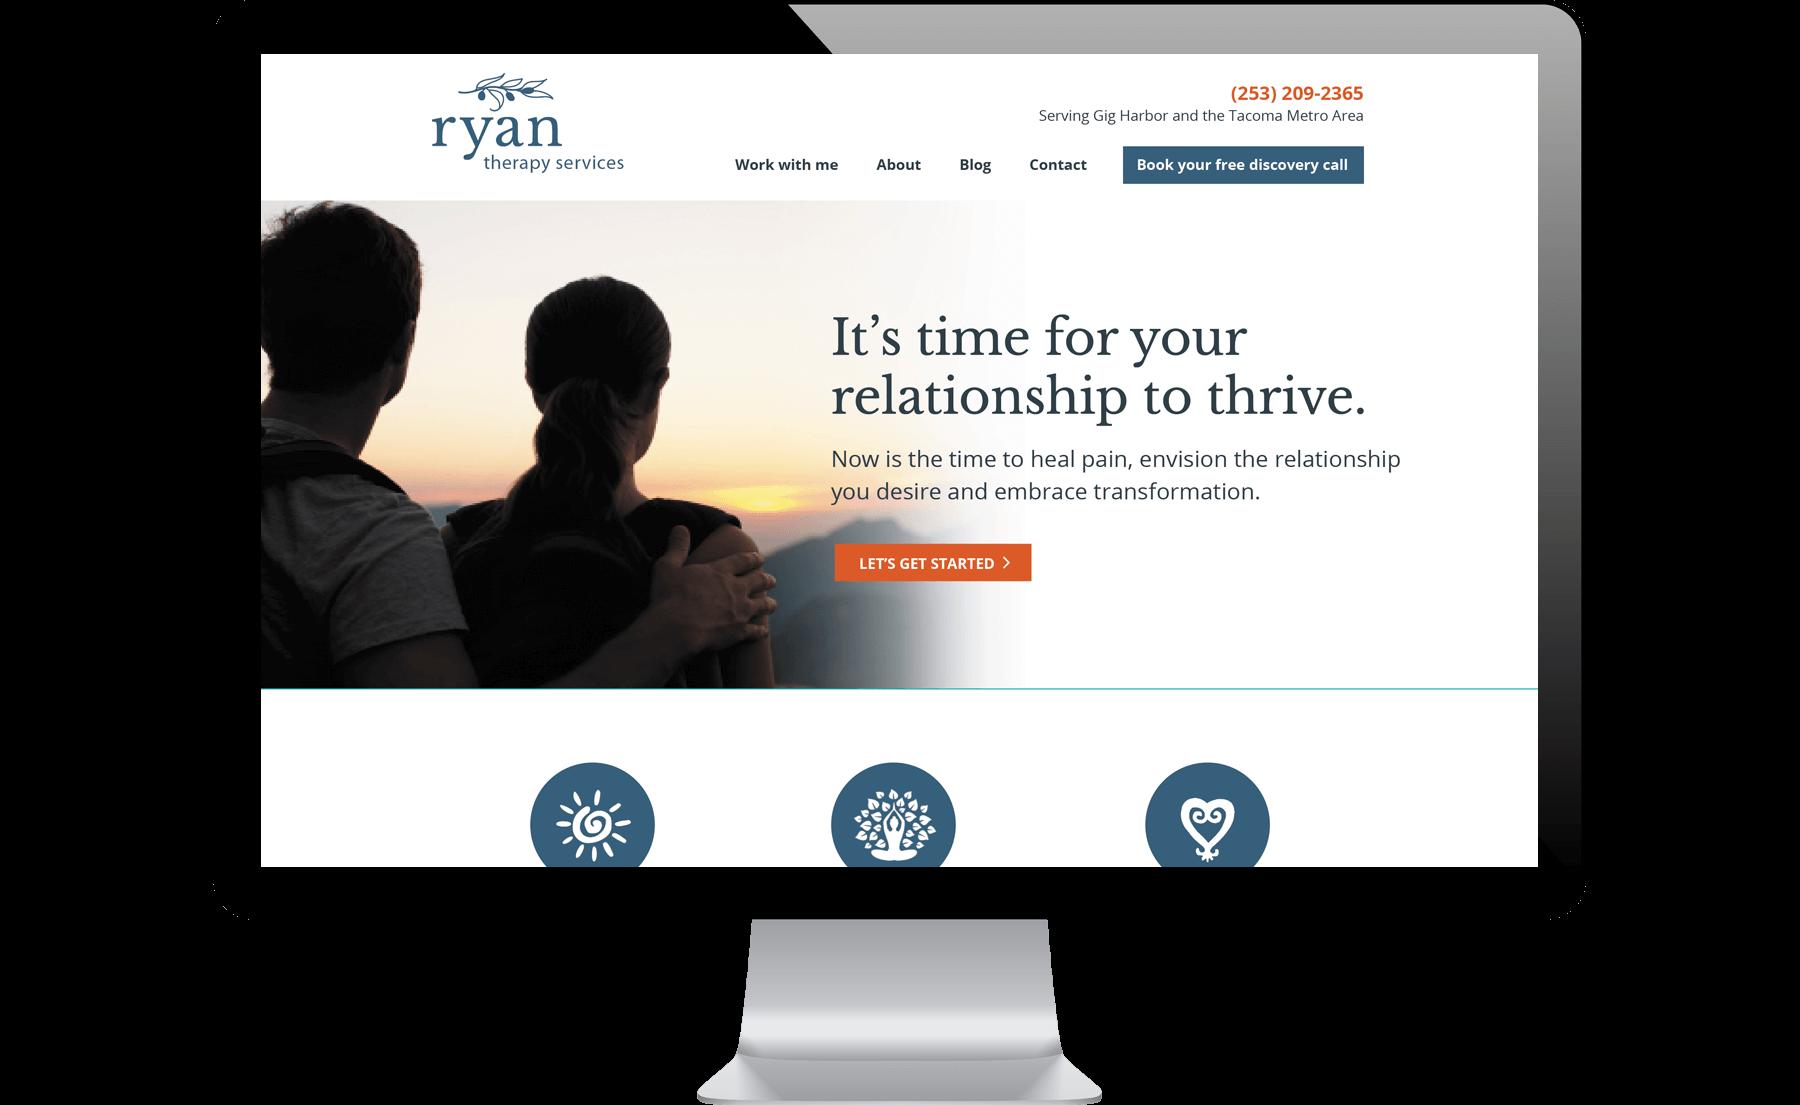 Couples Therapist Case Study – McBreen Marketing